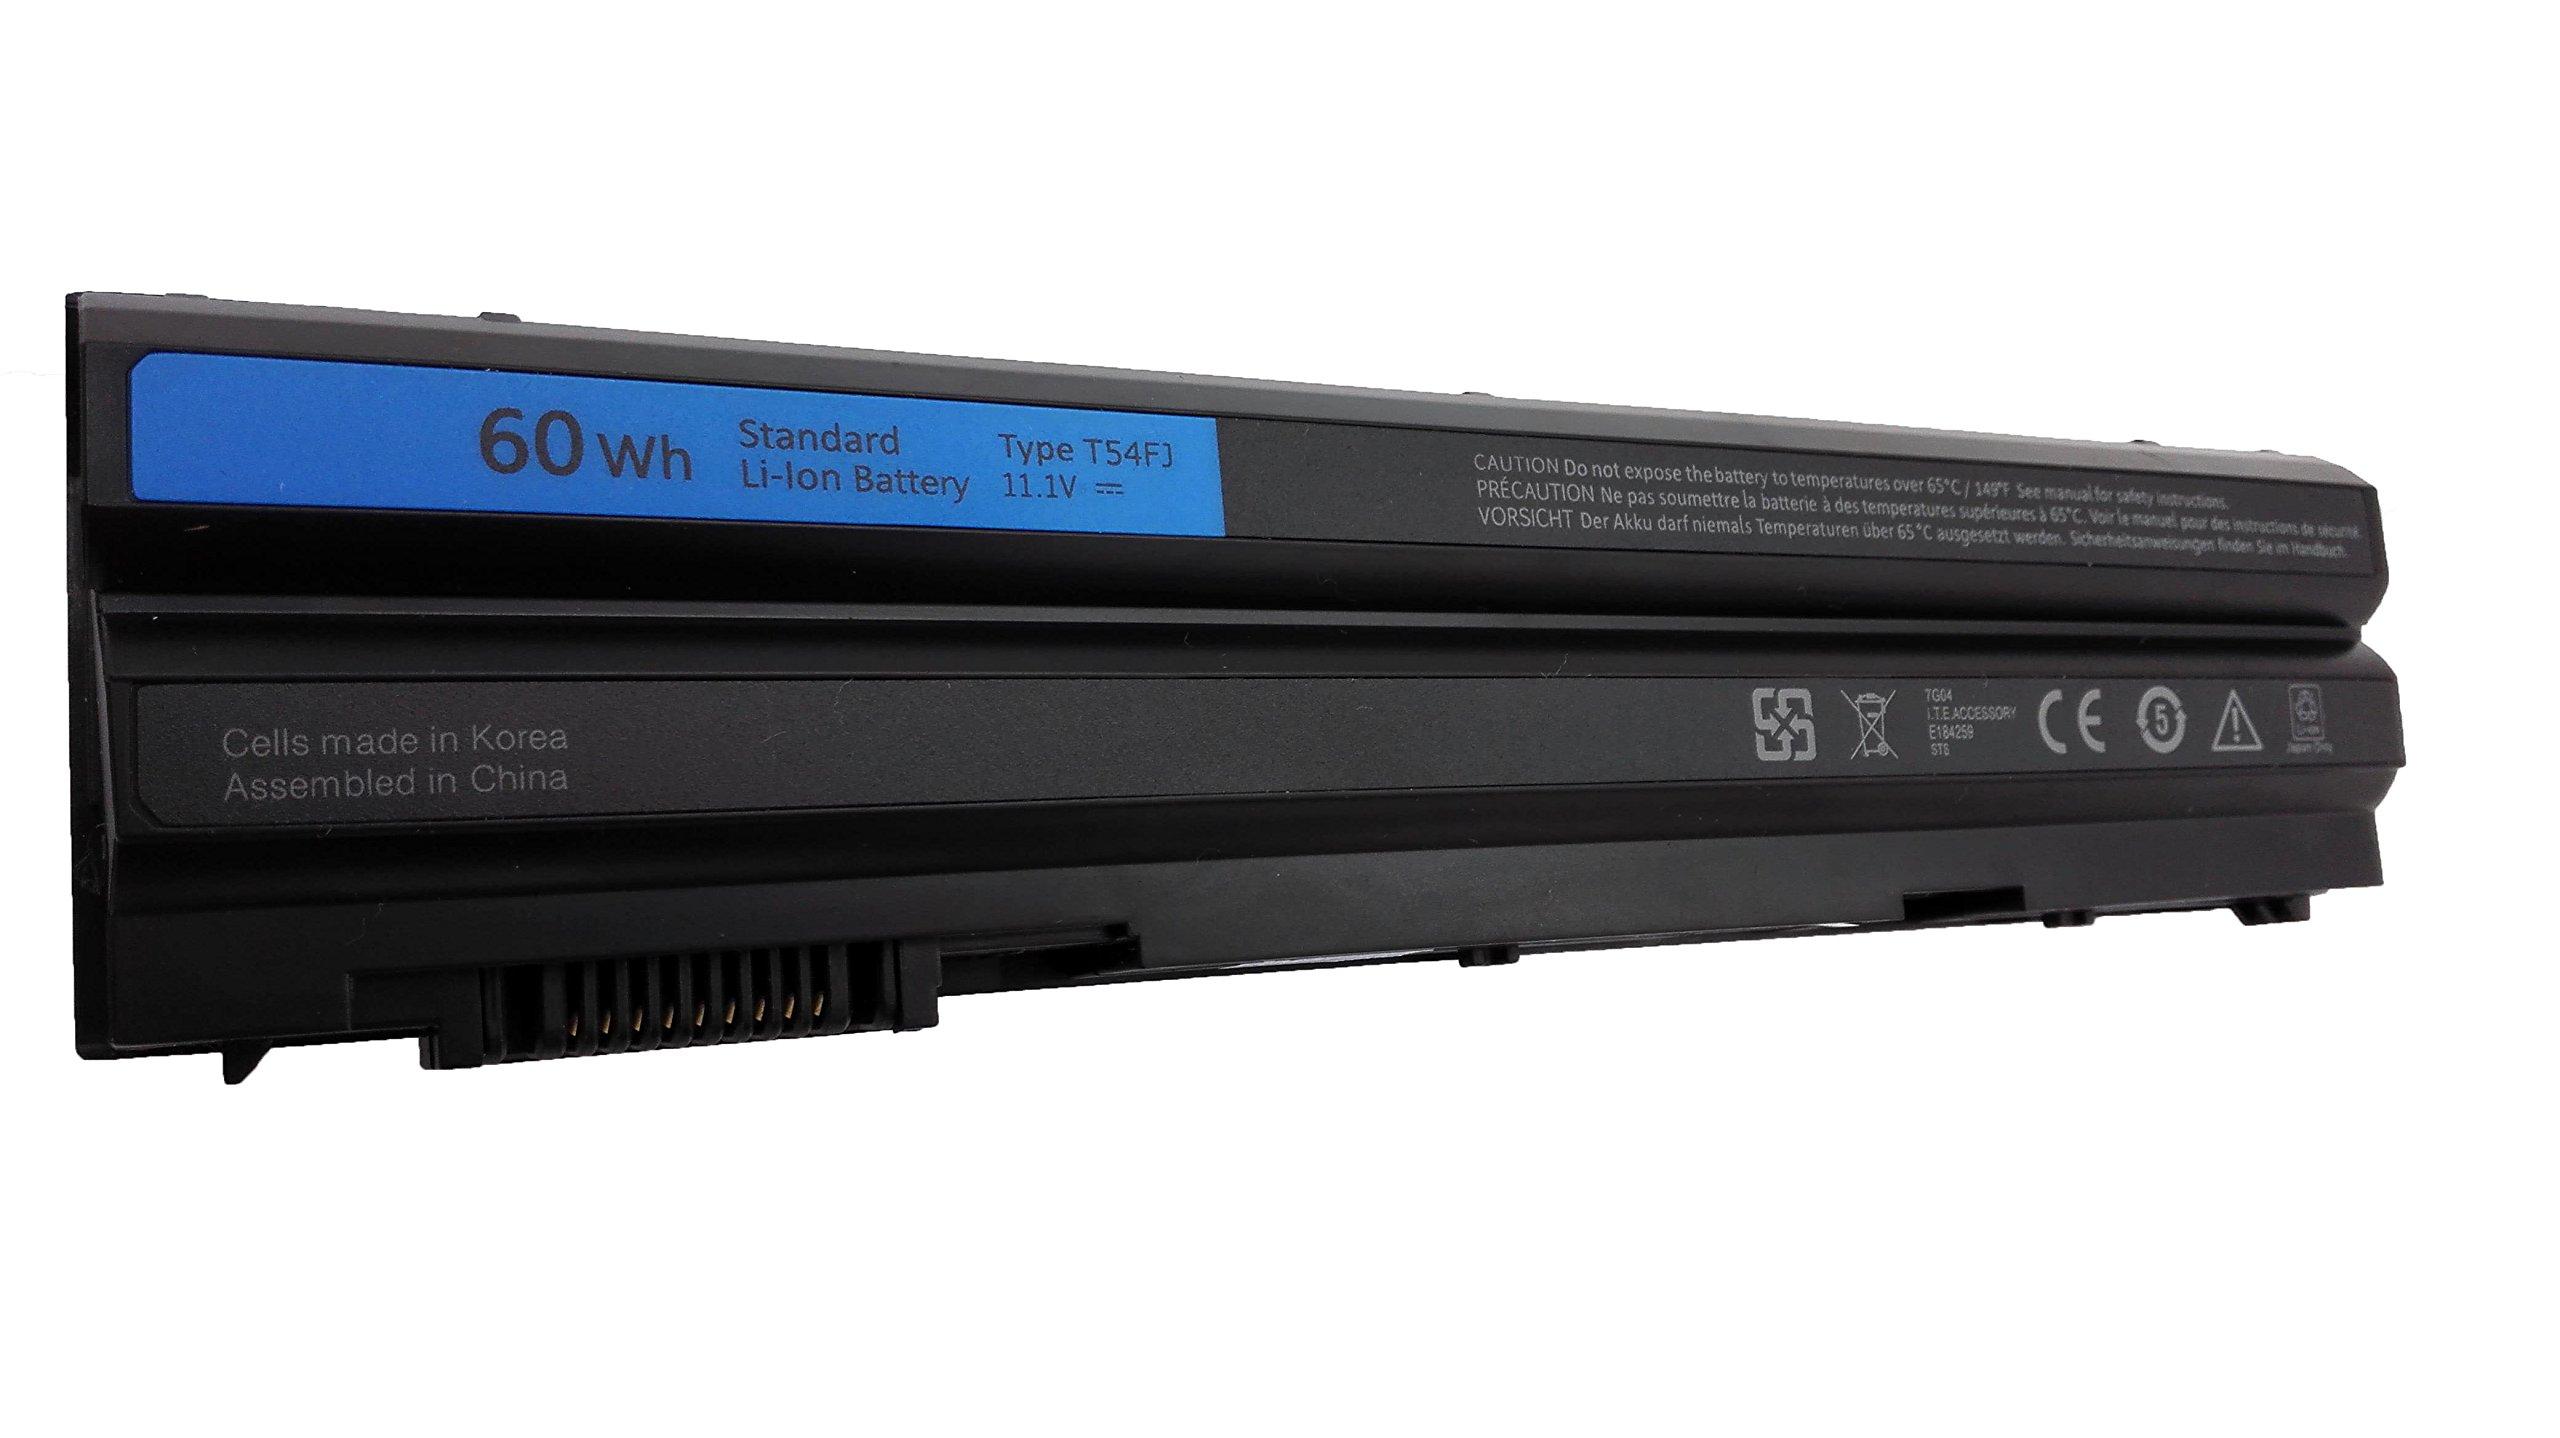 HYTA™ 6 Cell 11.1V 60Wh Brand New Laptop battery T54FJ For Dell Latitude E6420 E6430 E6520 E6530 E5420 E5520 E5430 E5530 Series